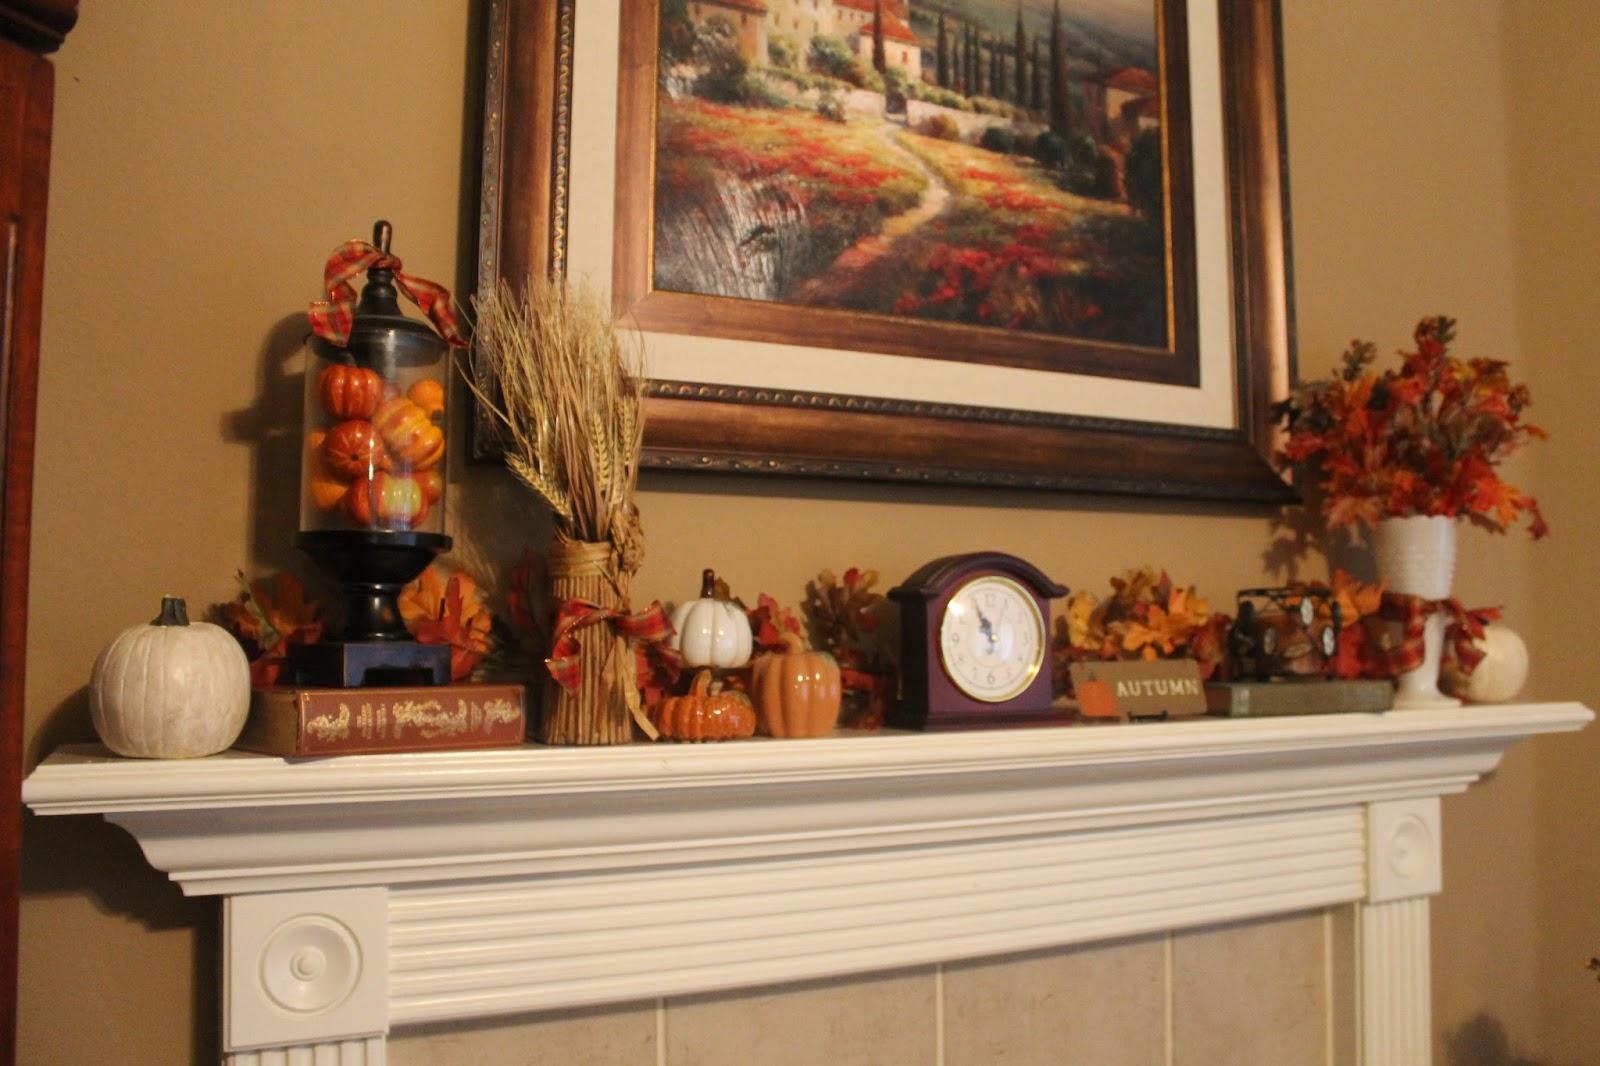 & Texas Decor: Fall Decor Part 1 Mantel and Living Room